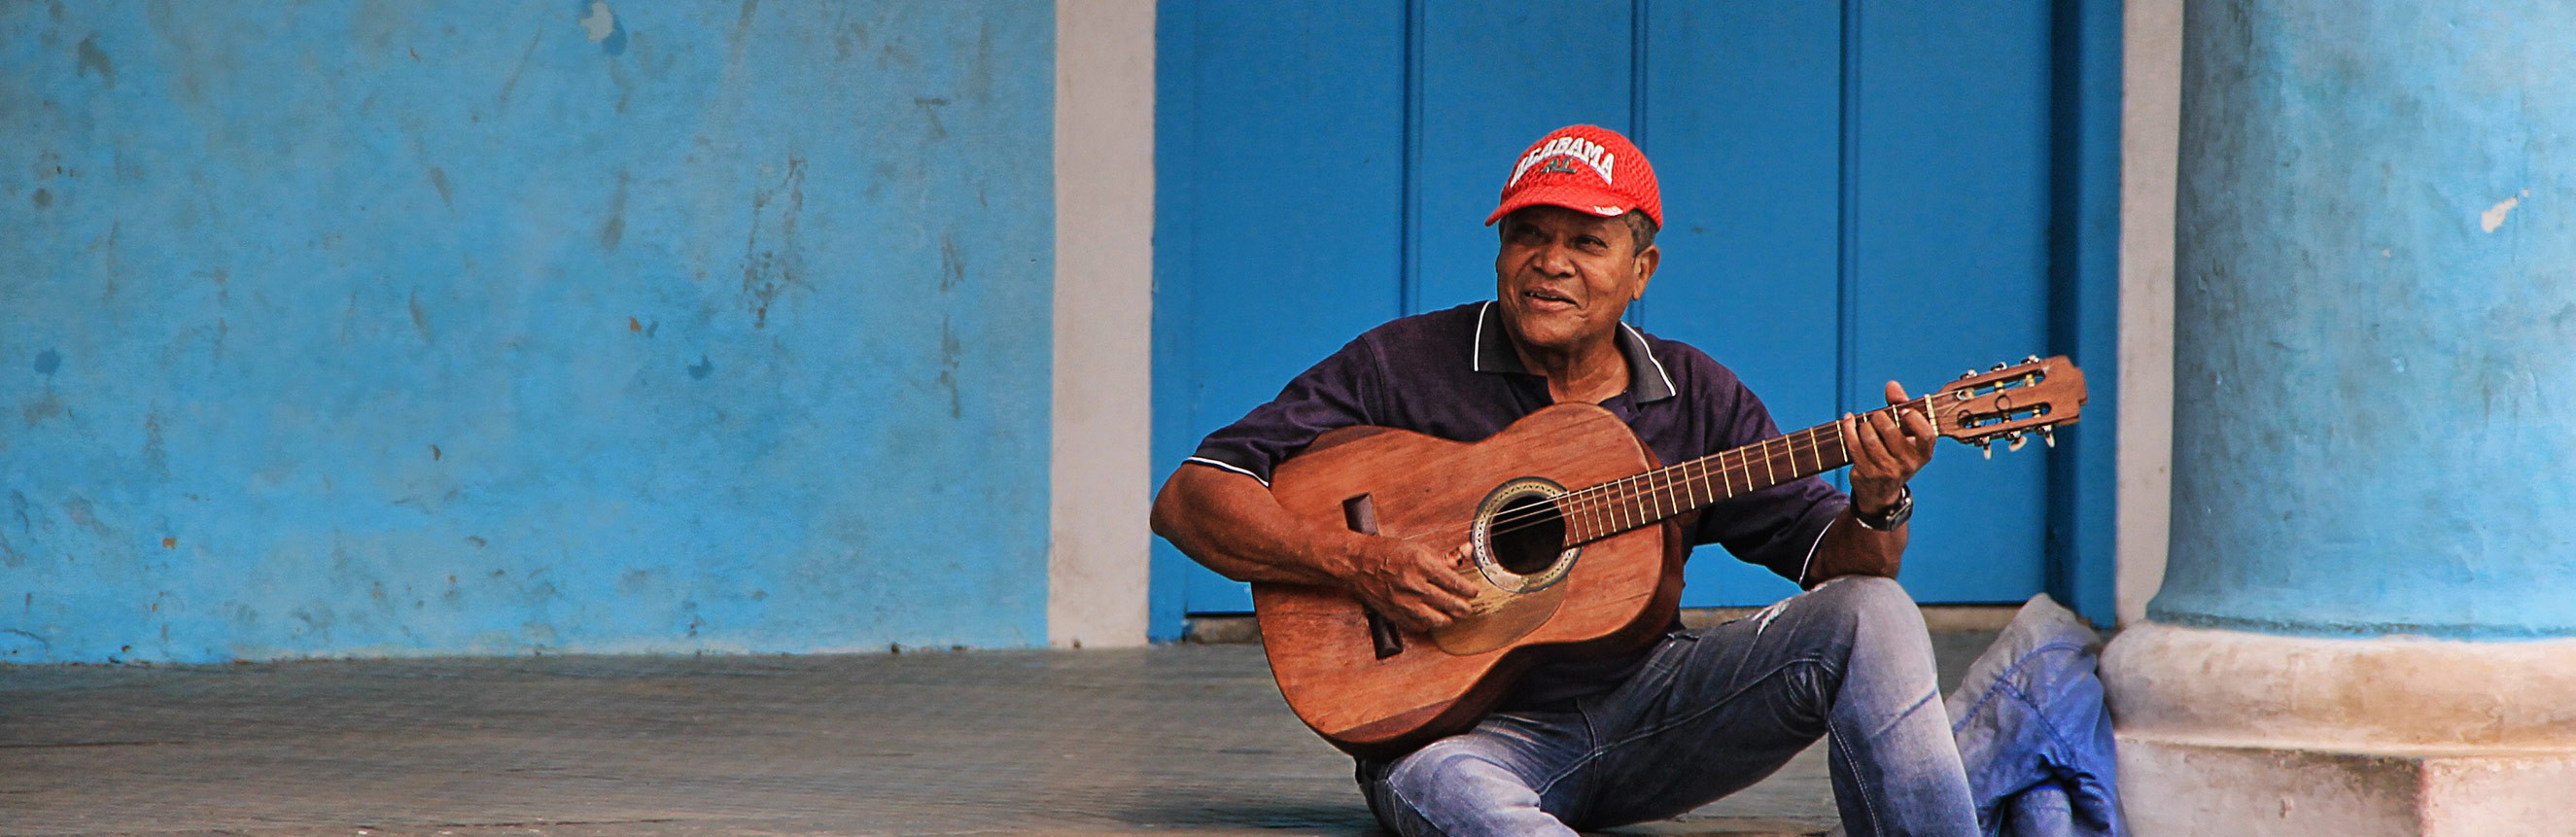 Kuba, Strassenmusiker